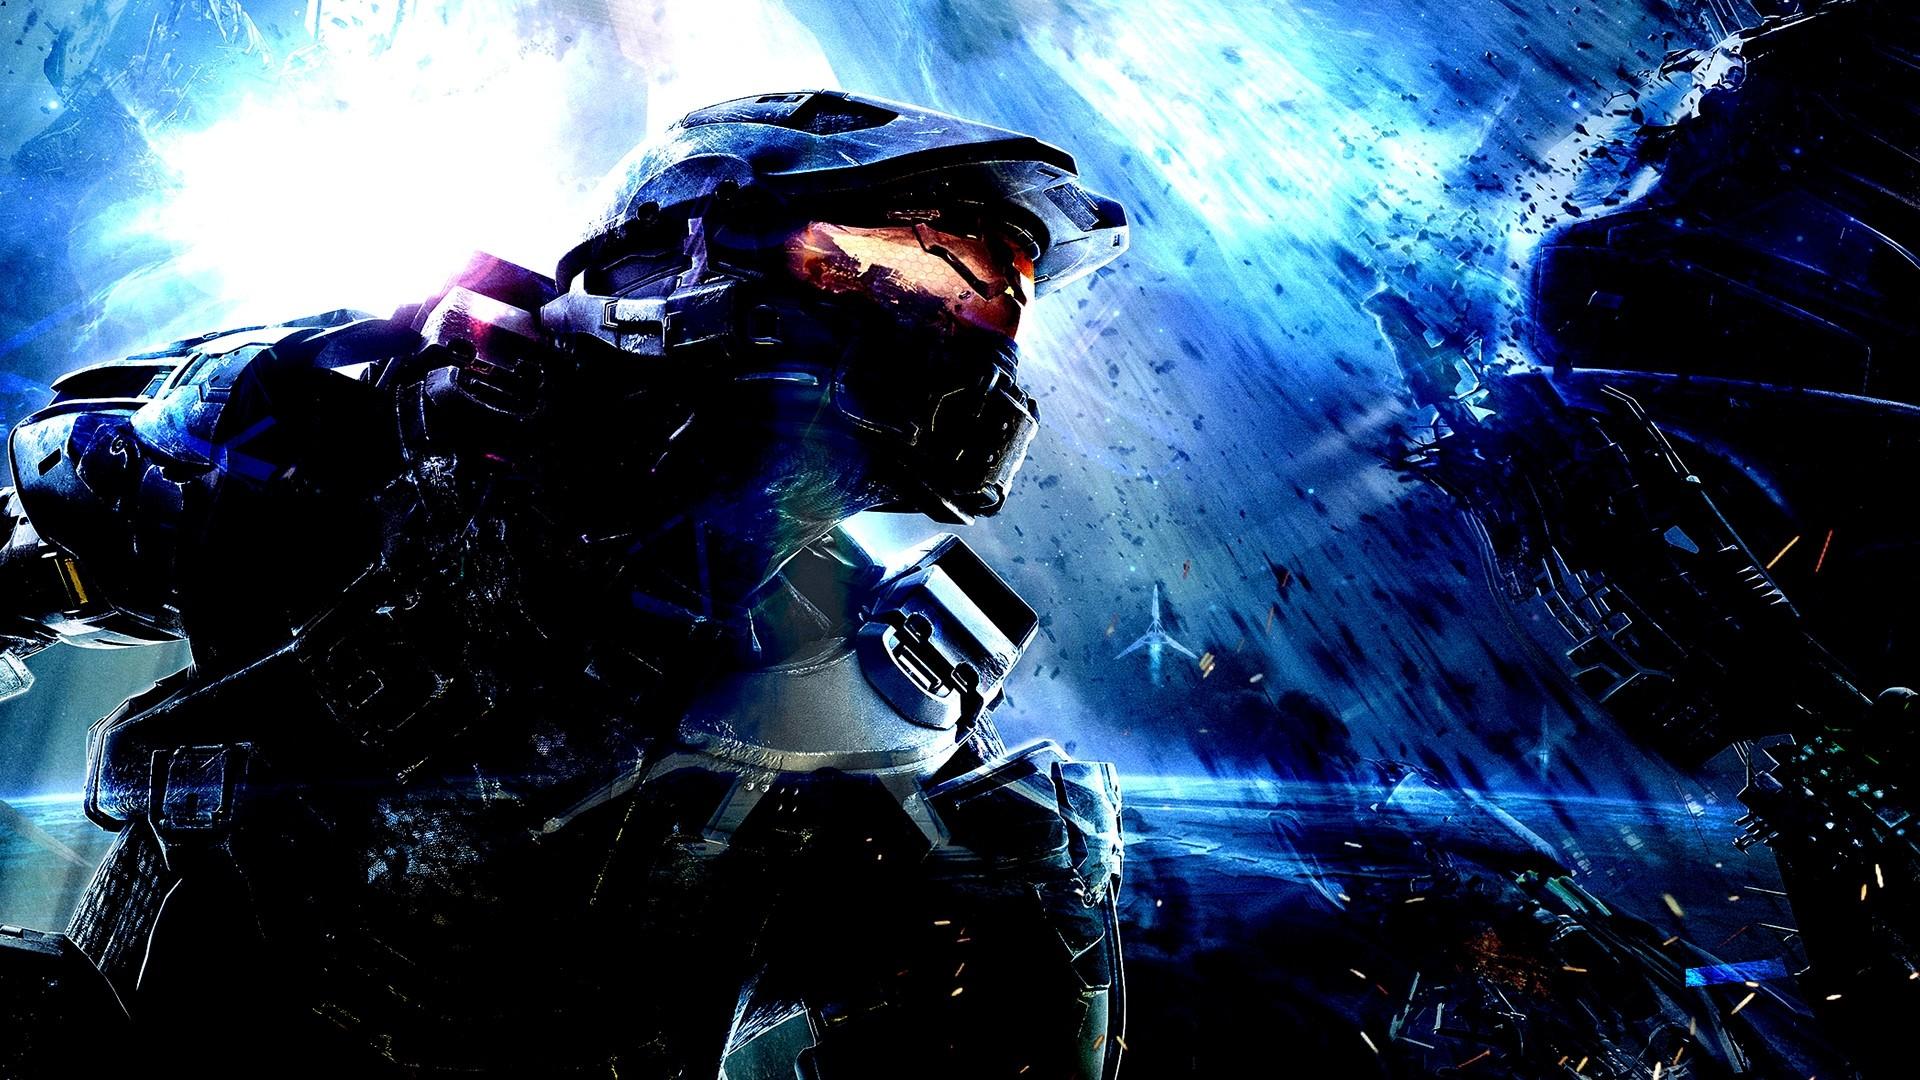 HD Halo 4 Photos. HD Halo 4 Wallpapers · halo 4 wallpaper 1360×768 …